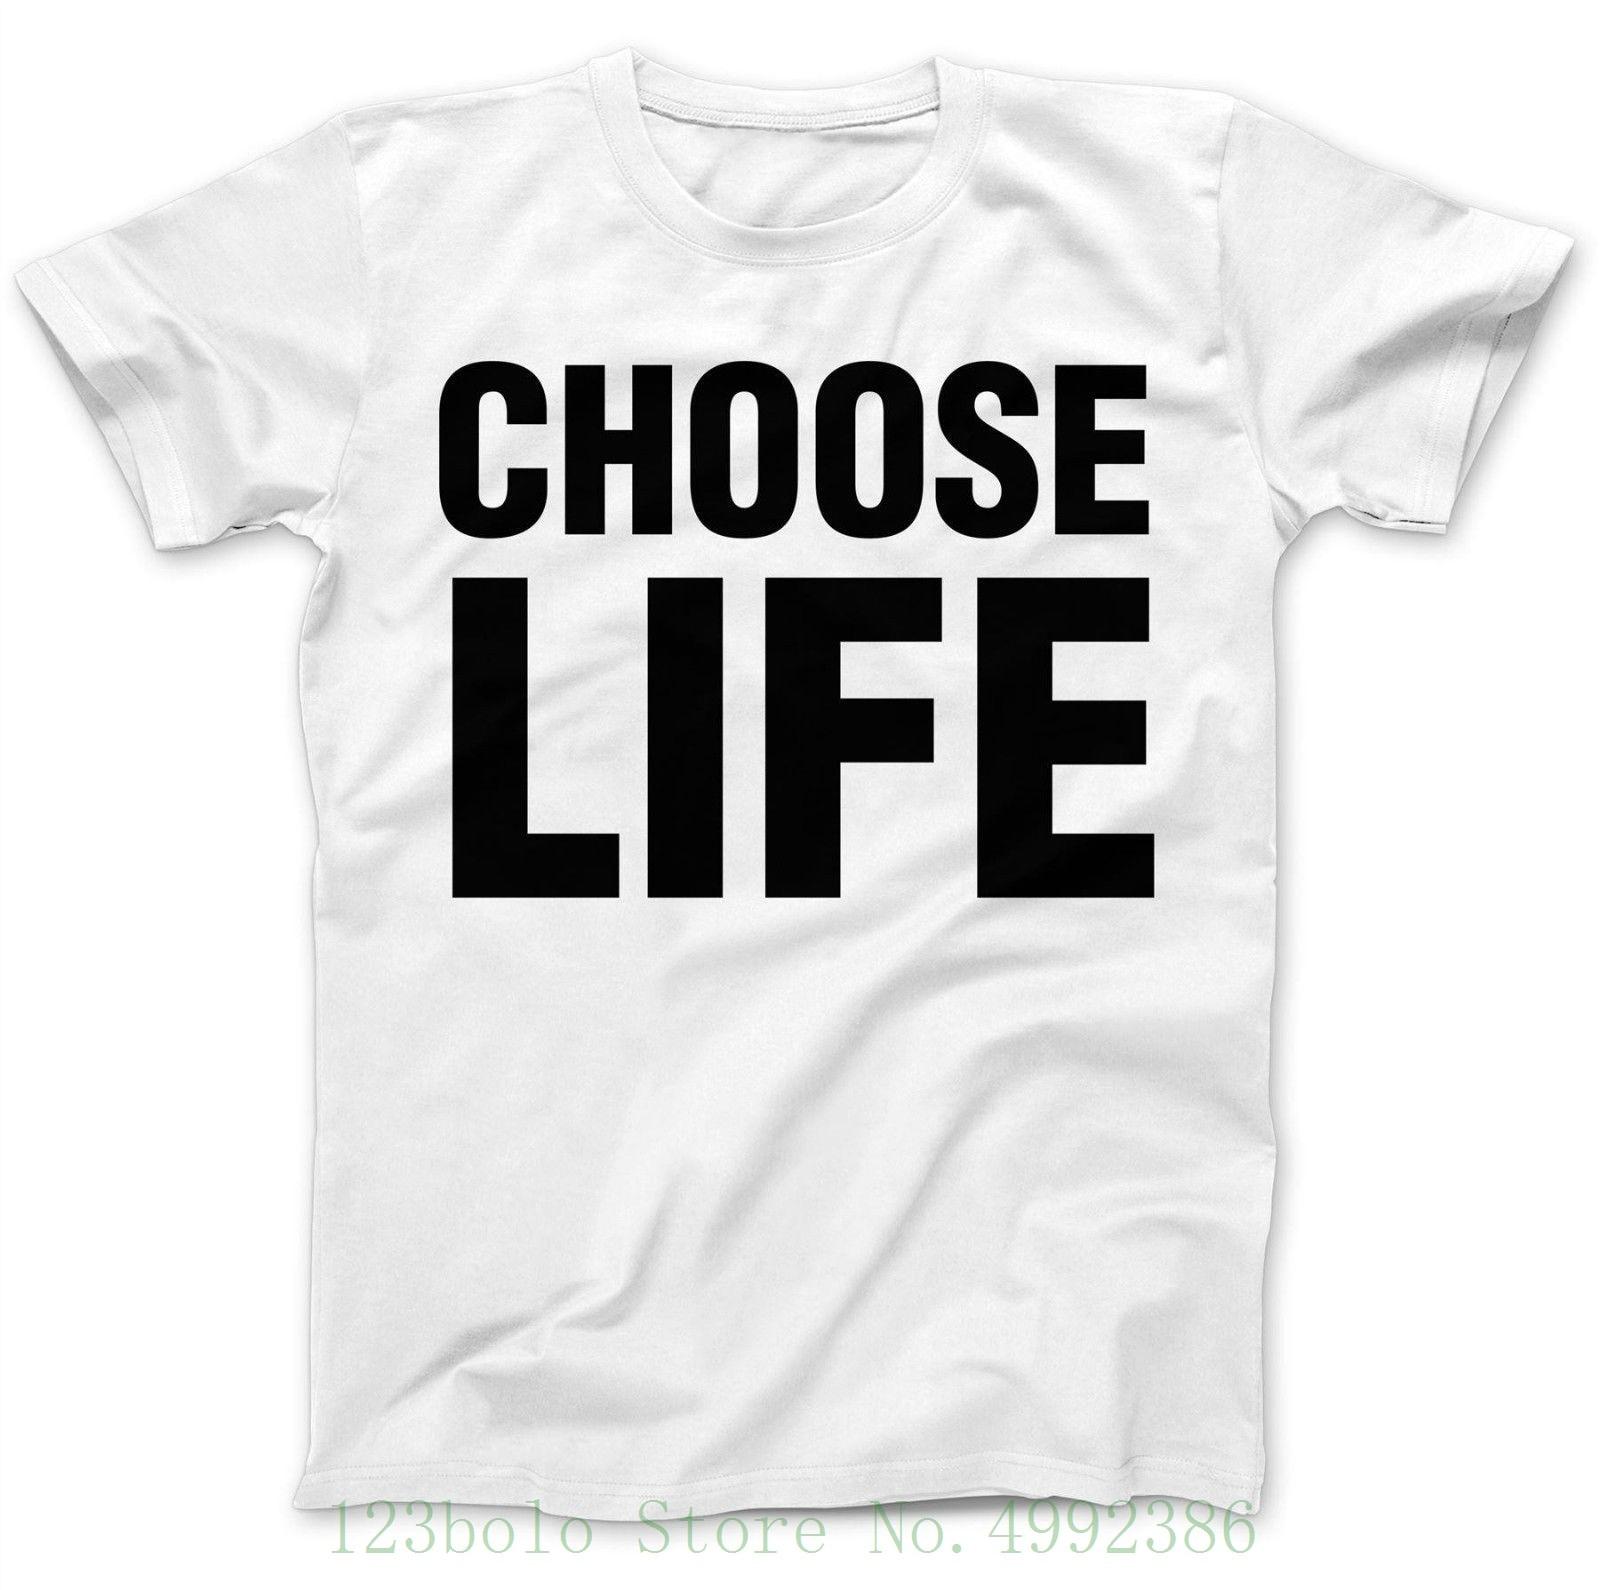 choose life t shirt dress